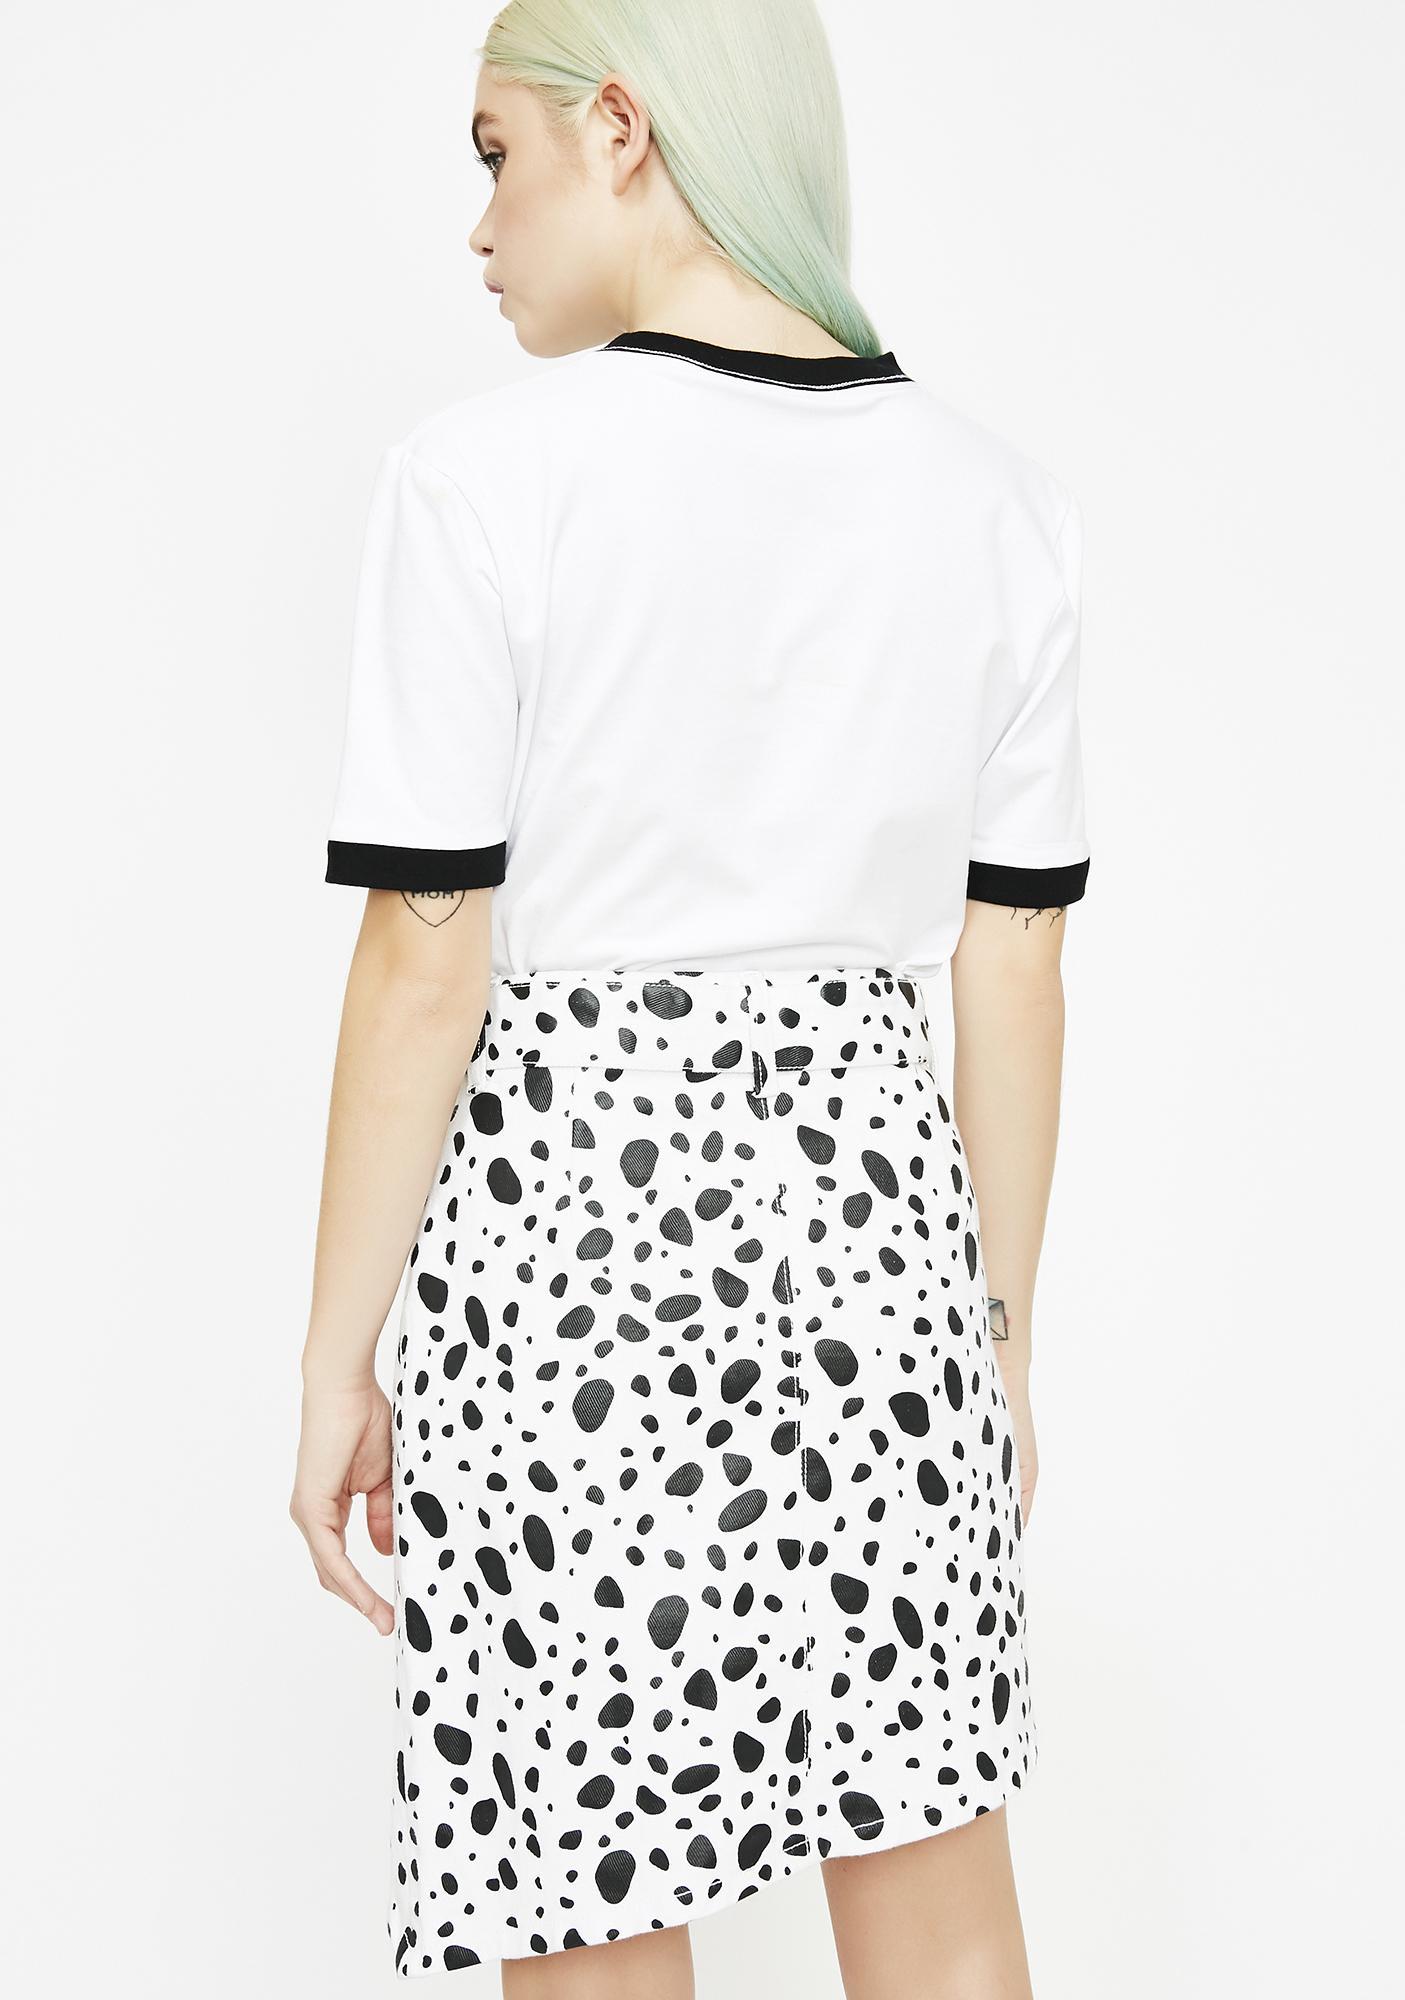 Nana Judy x Disney Stone Groove Skirt